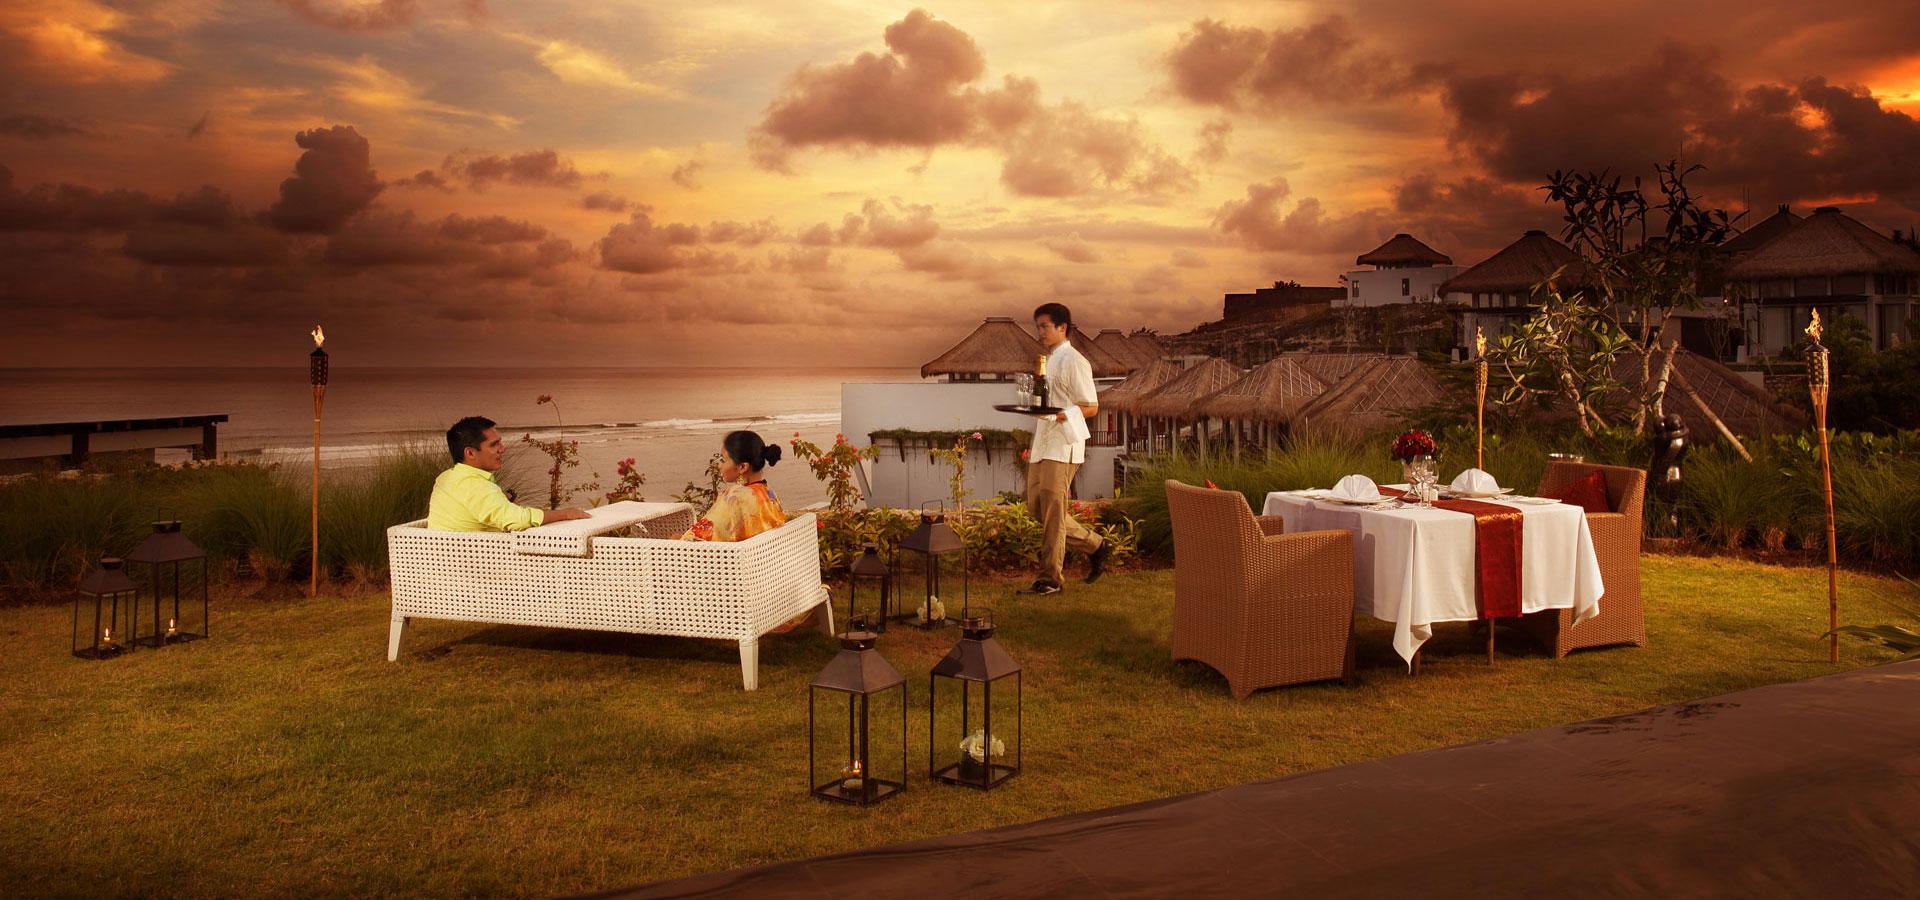 Bali Honeymoon Bali Private Villa Nusa Dua Resort For Honeymoon